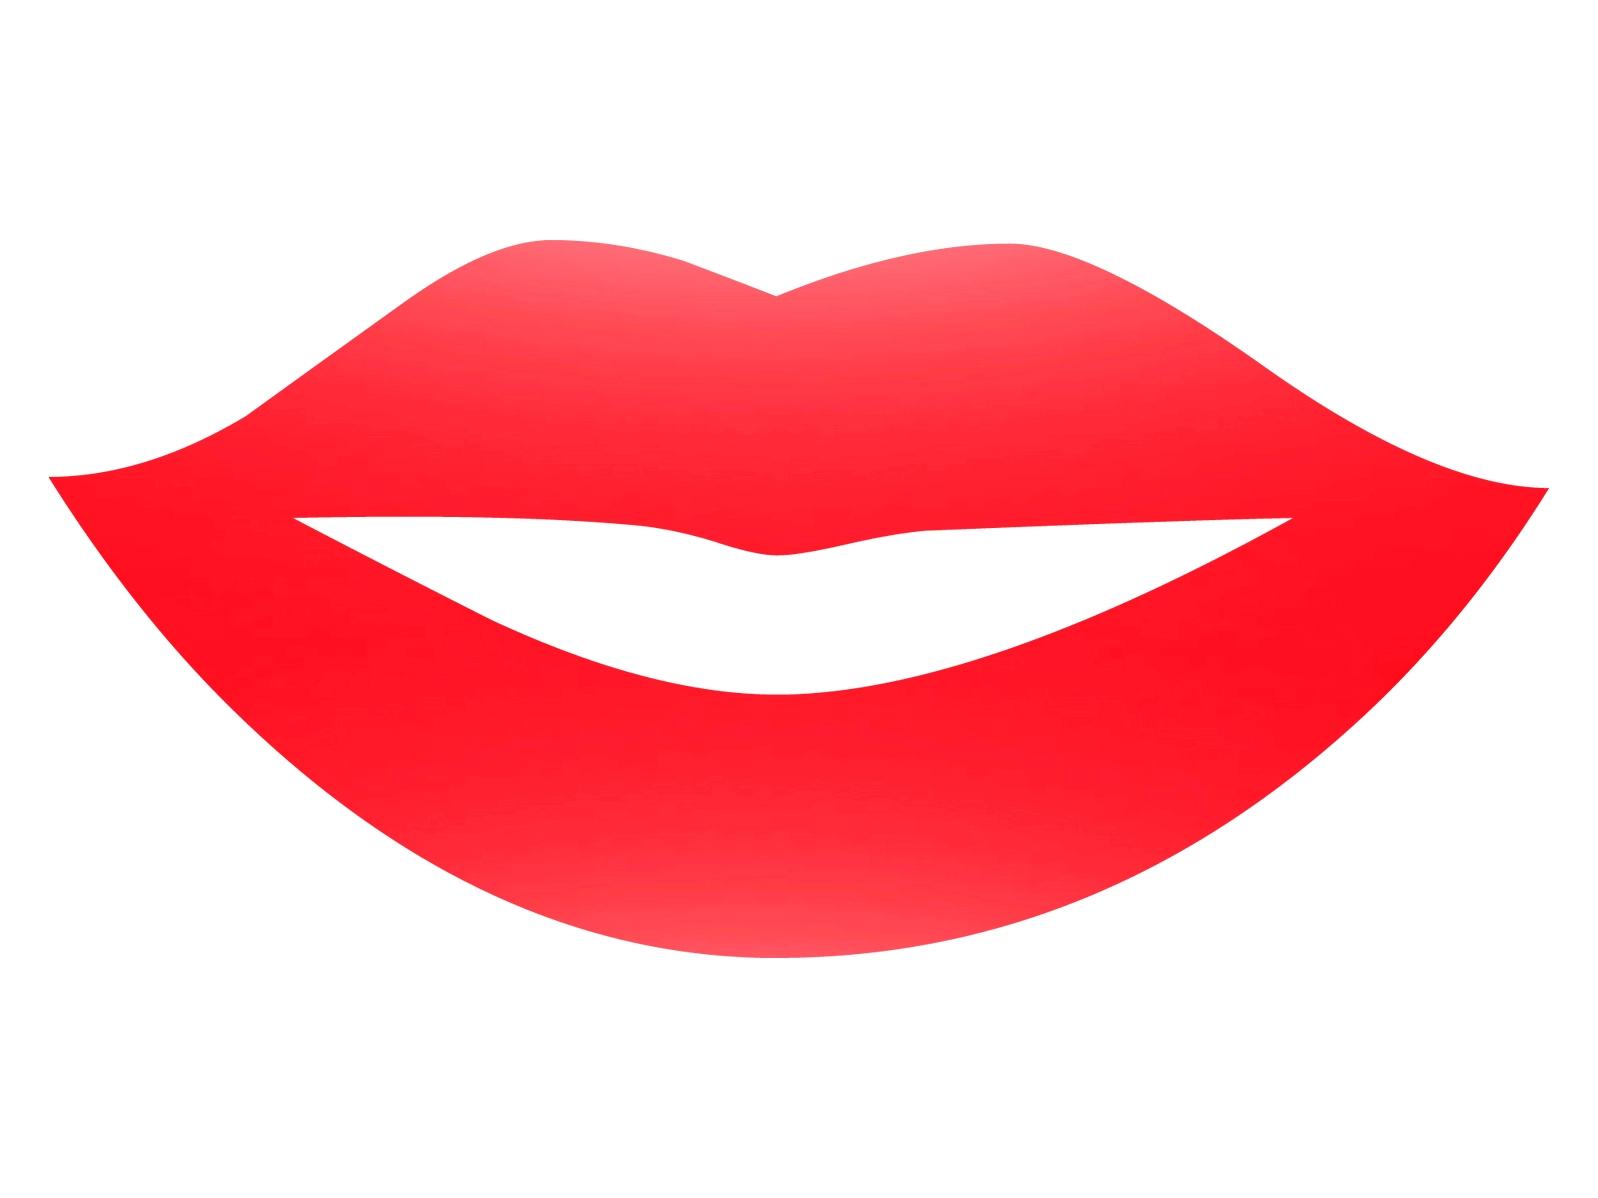 Lip clipart boy lip. Boys lips smiling no